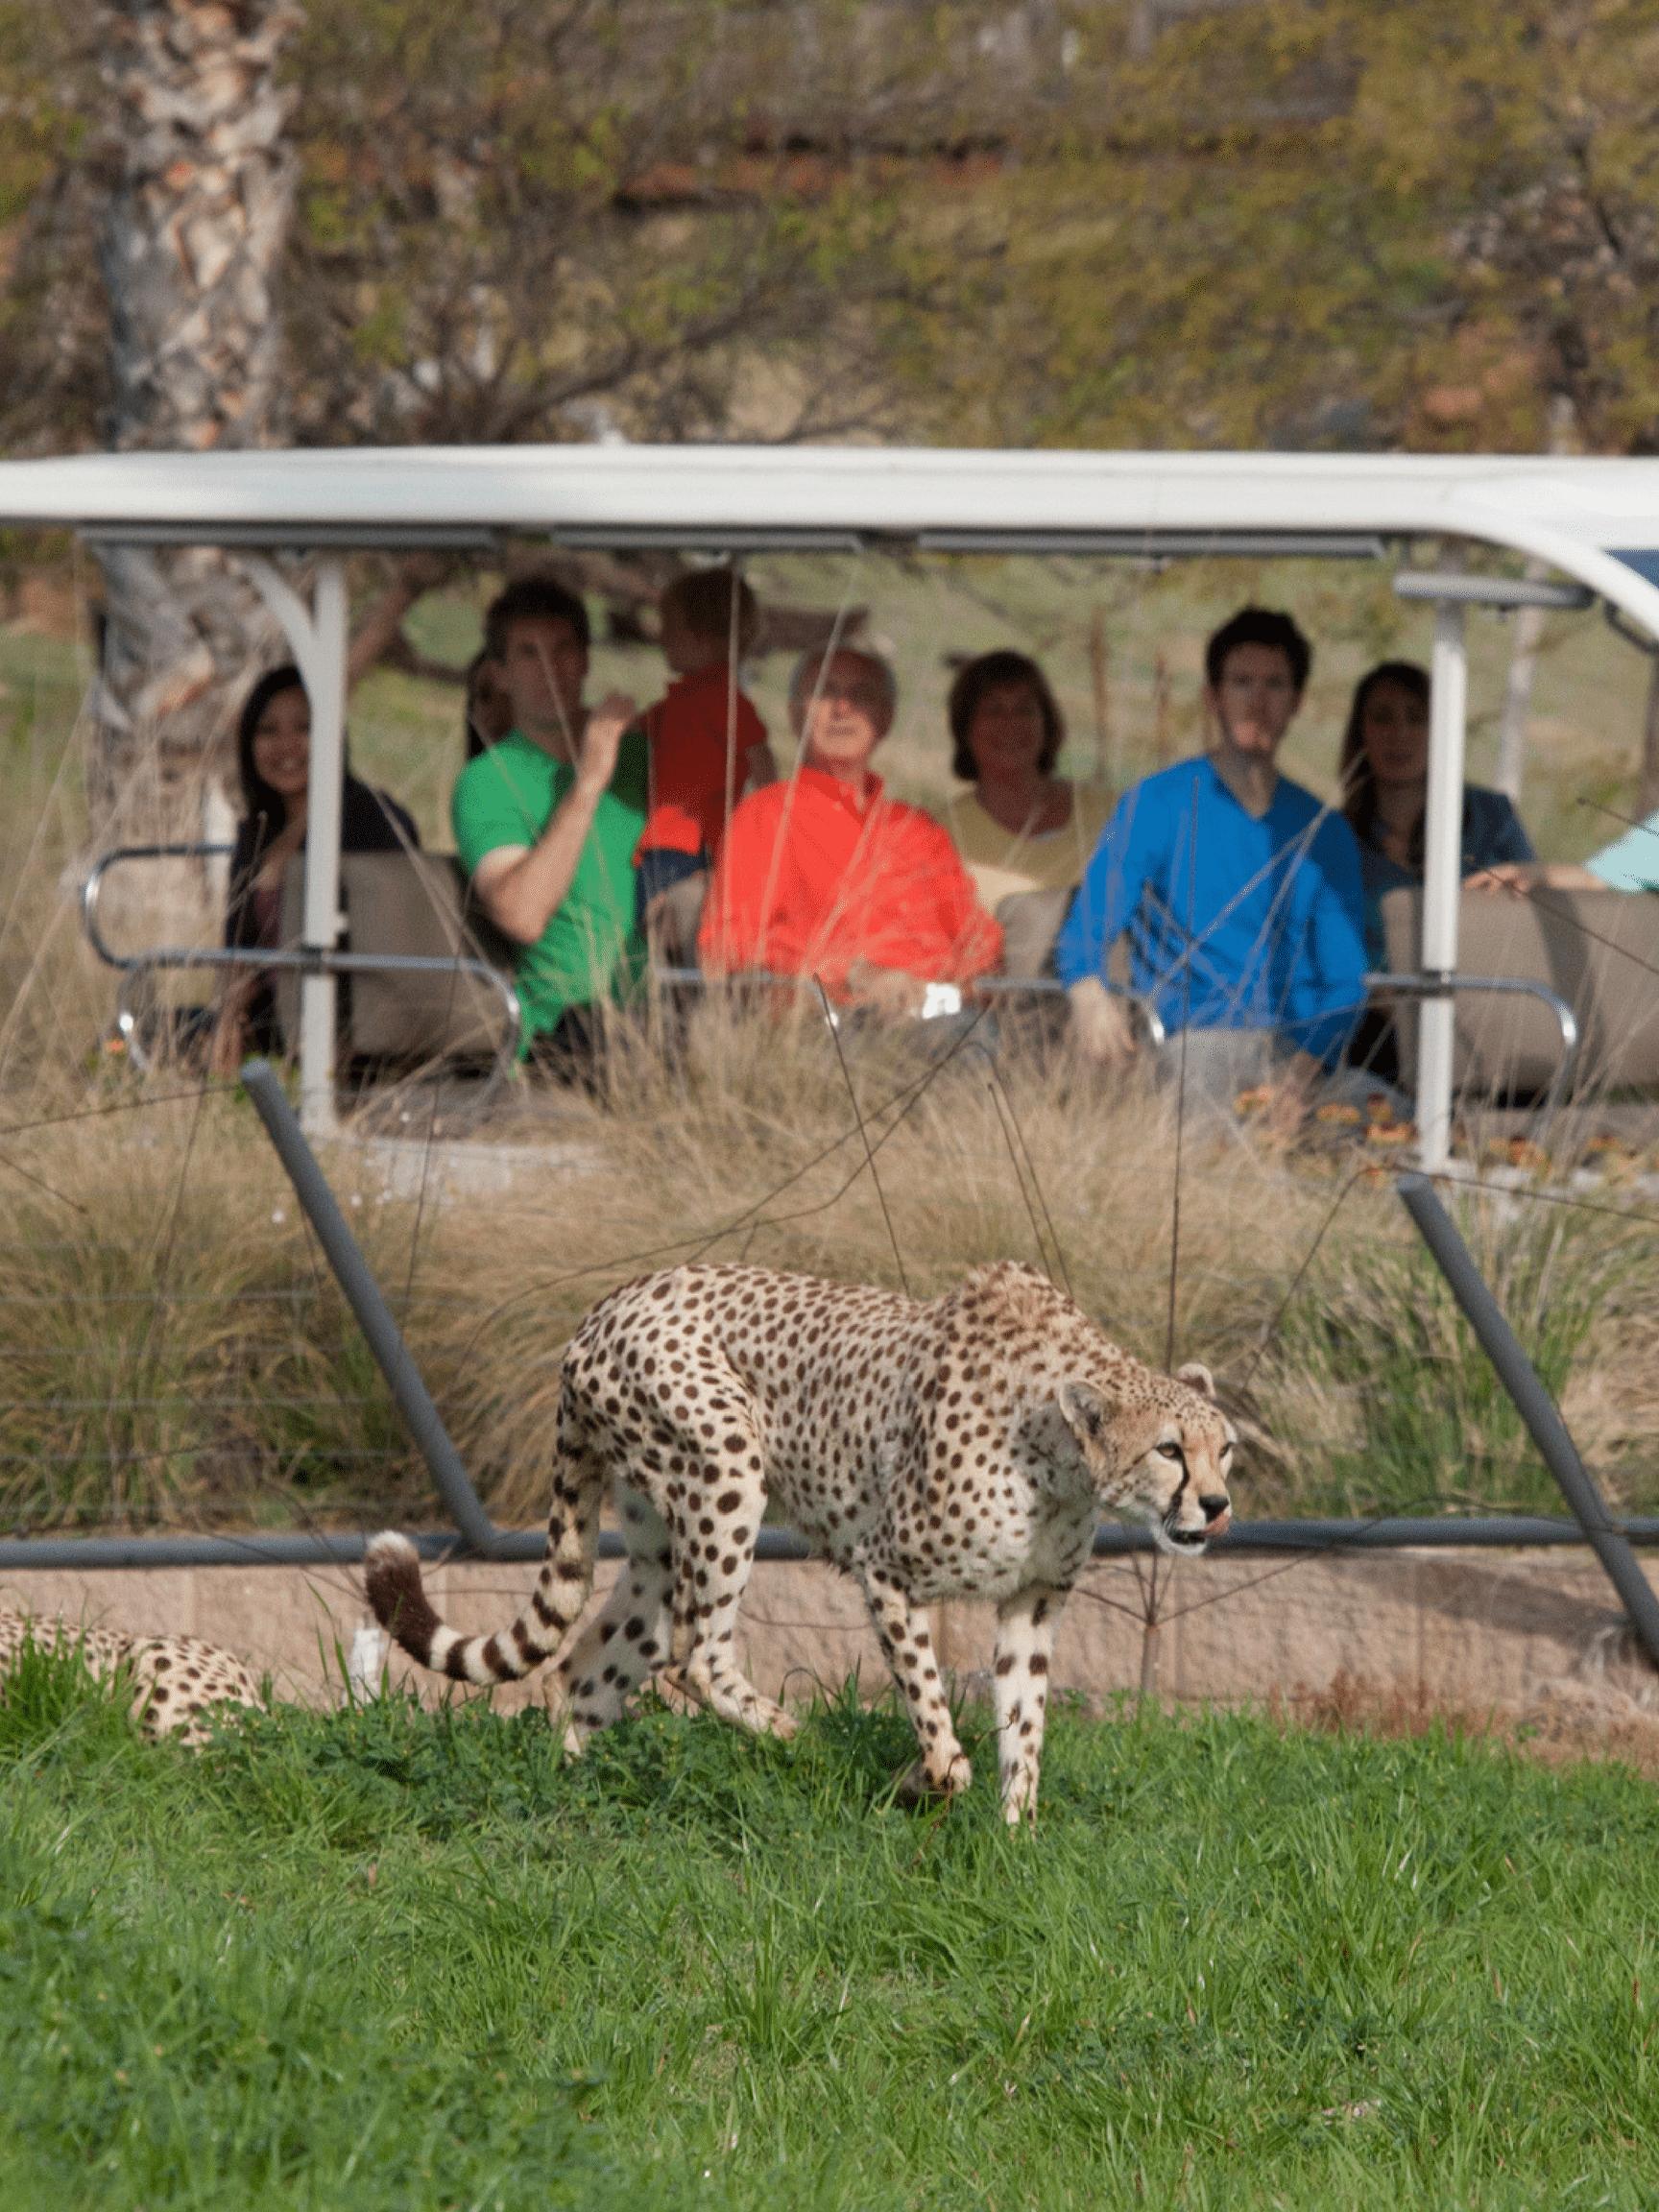 San Diego Zoo Safari Park Detailed Guide 2020 San Diego Safari